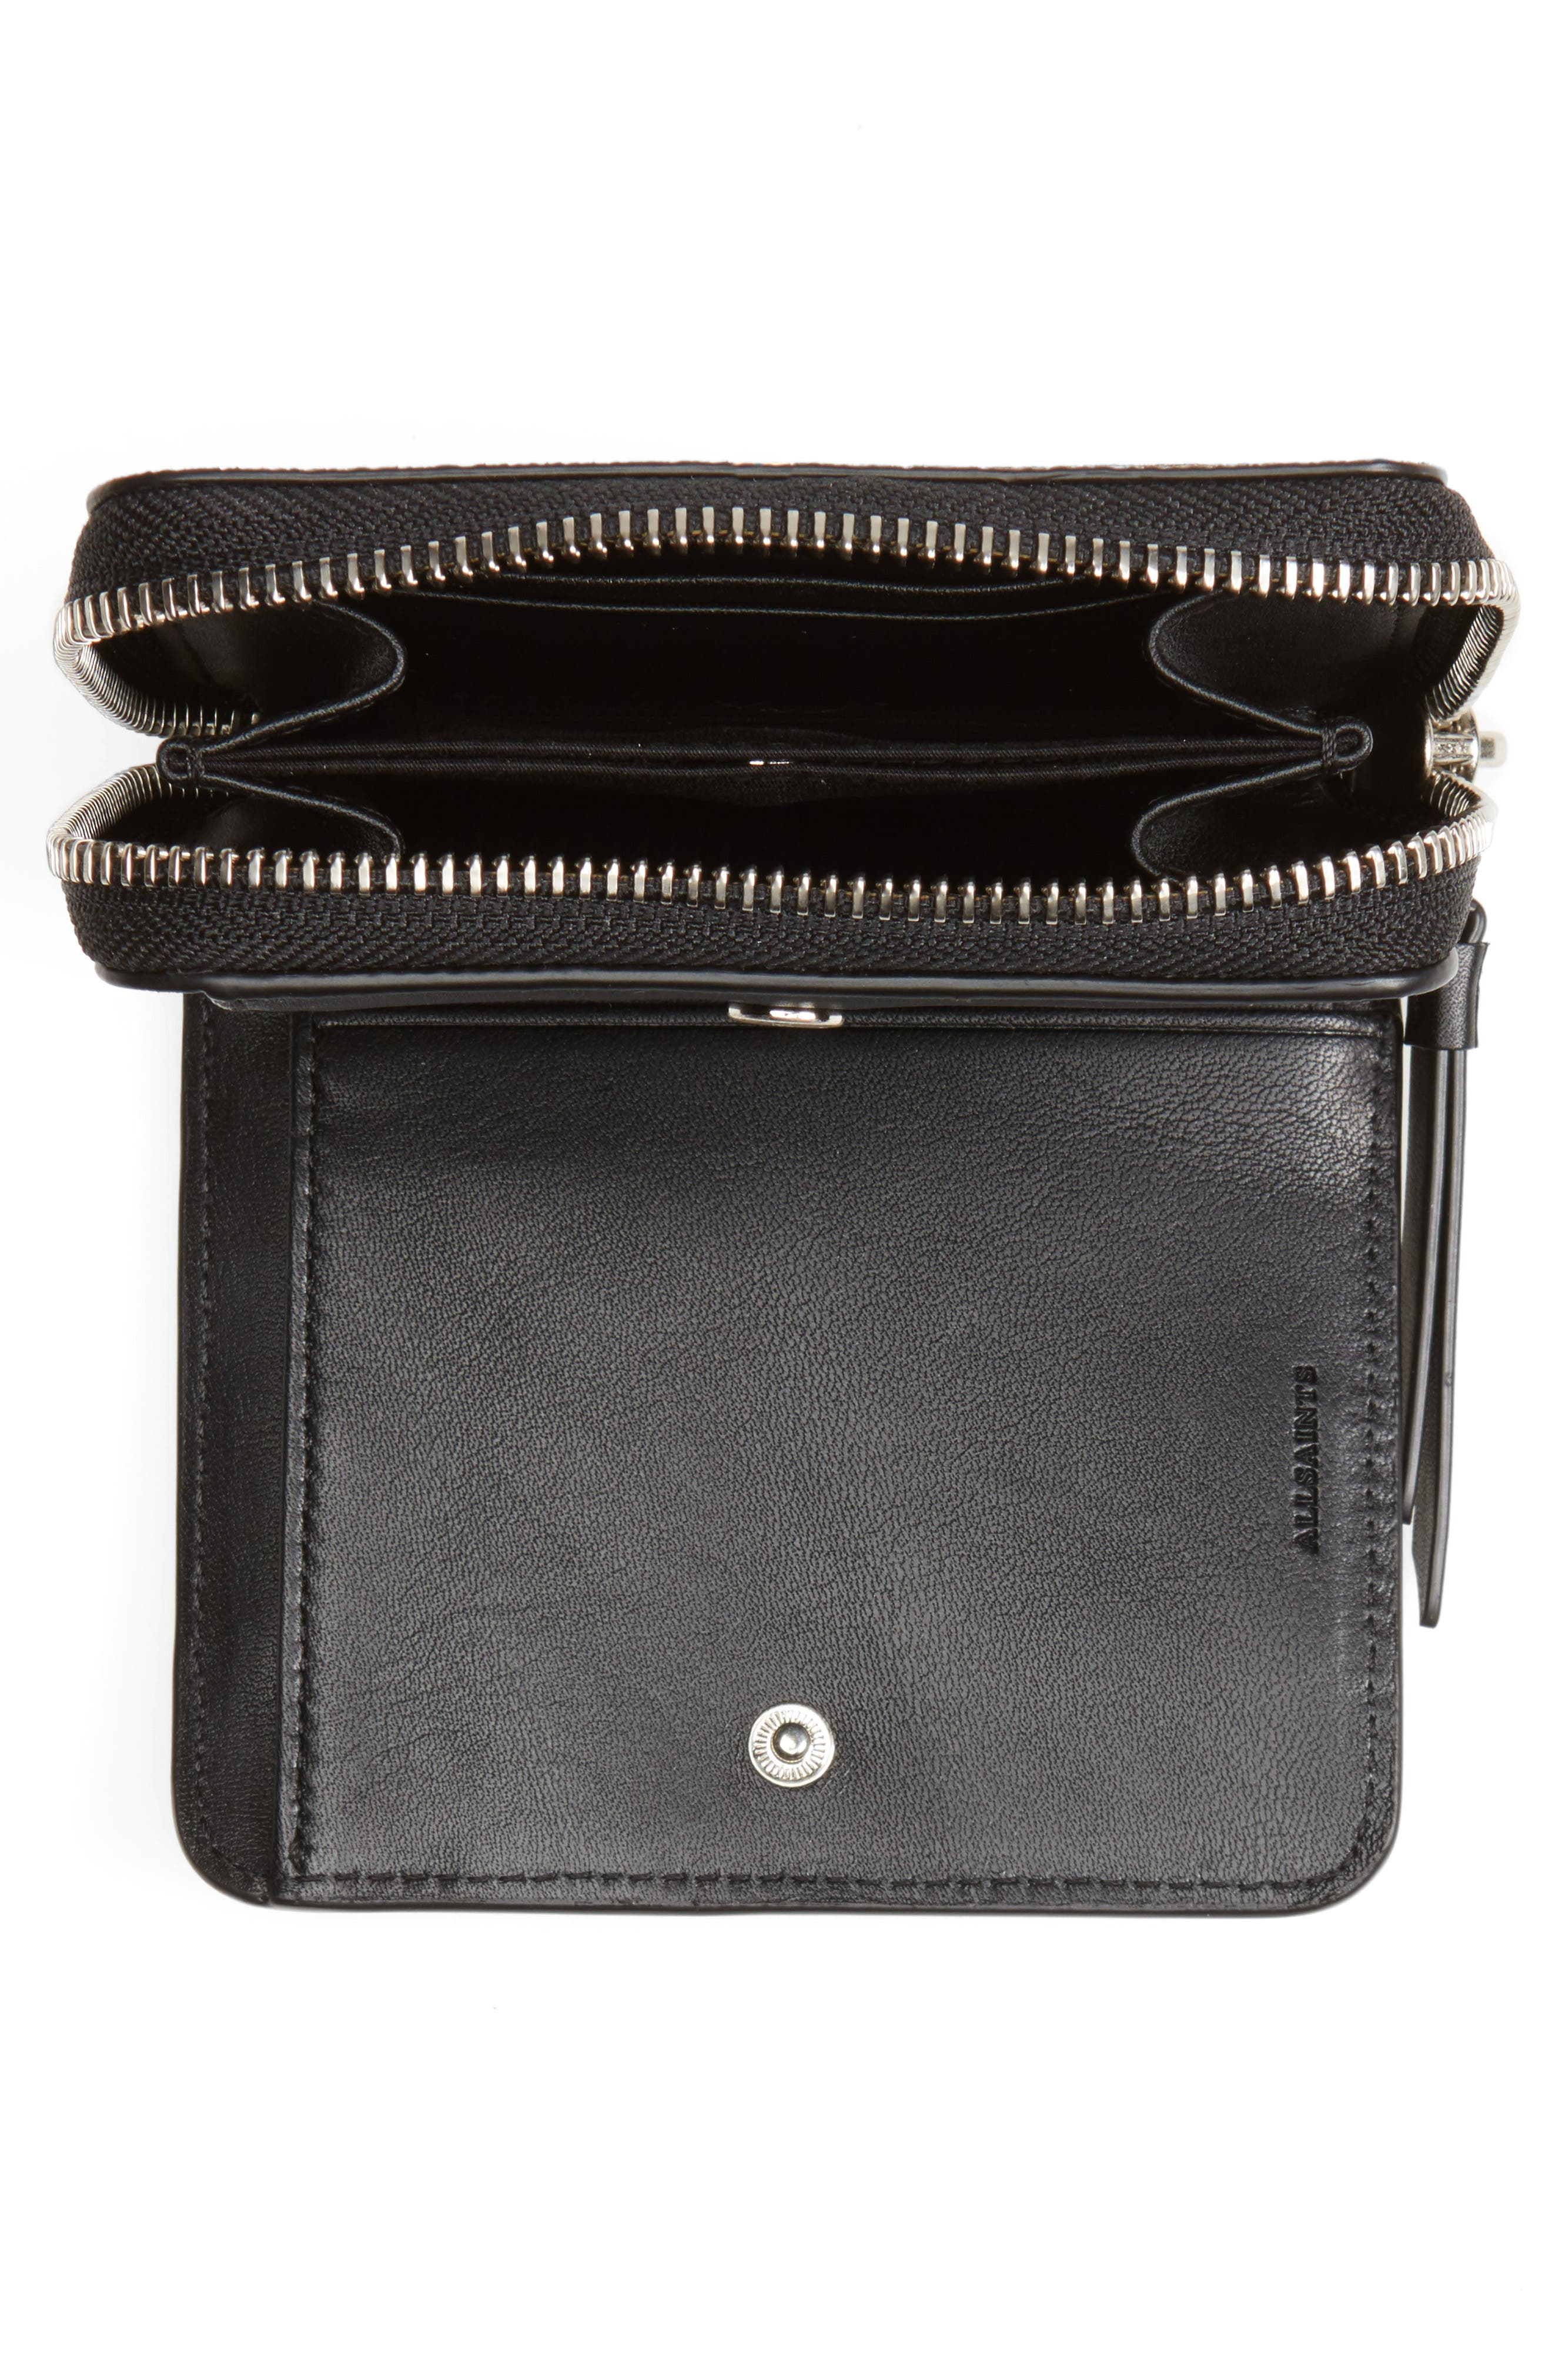 Mast Shine Leather Wallet,                             Alternate thumbnail 2, color,                             001